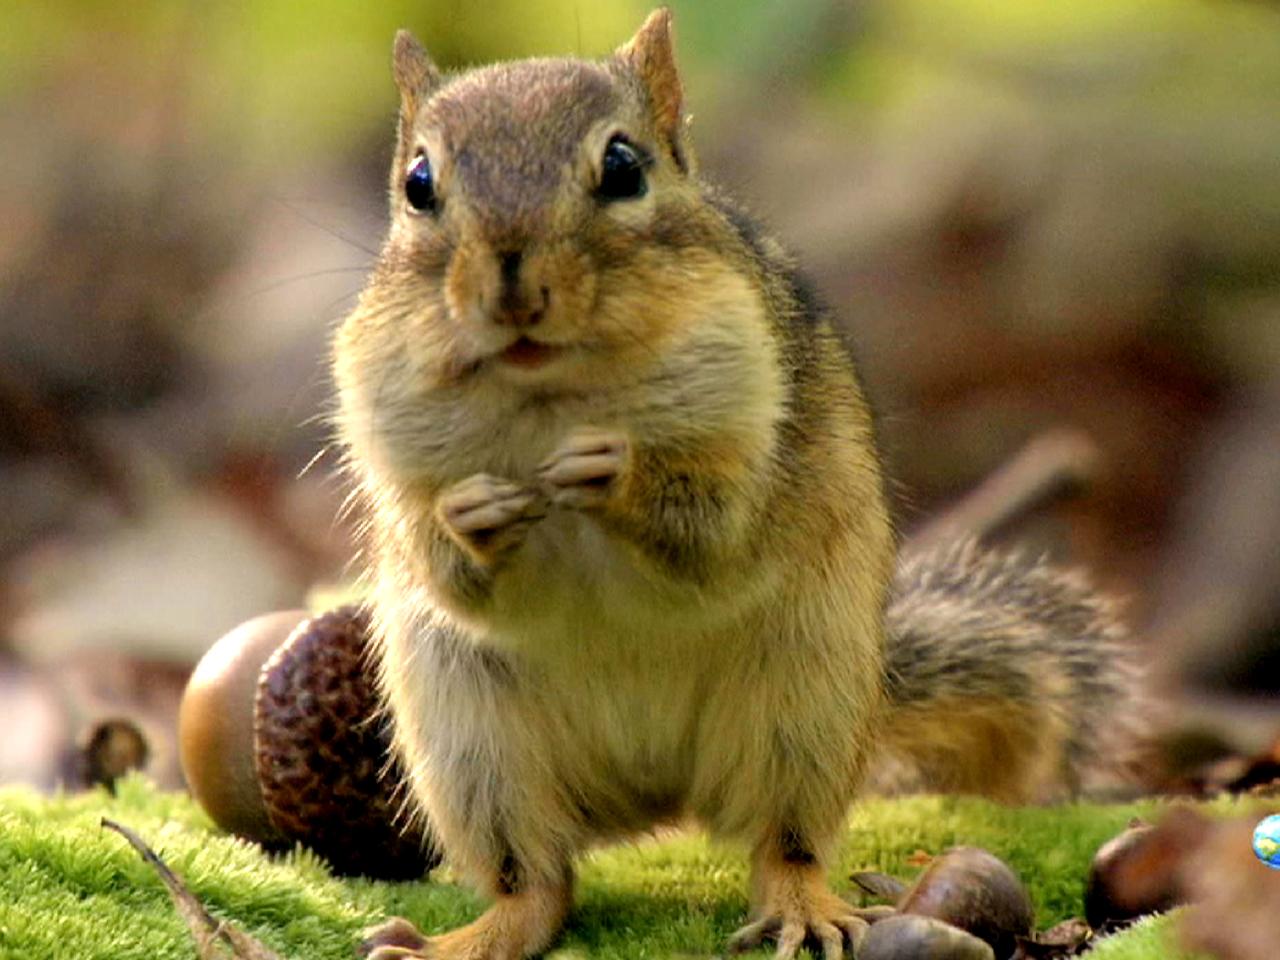 Bing Animated Wallpaper Hi Yah Chipmunks Battle For Acorns On North America